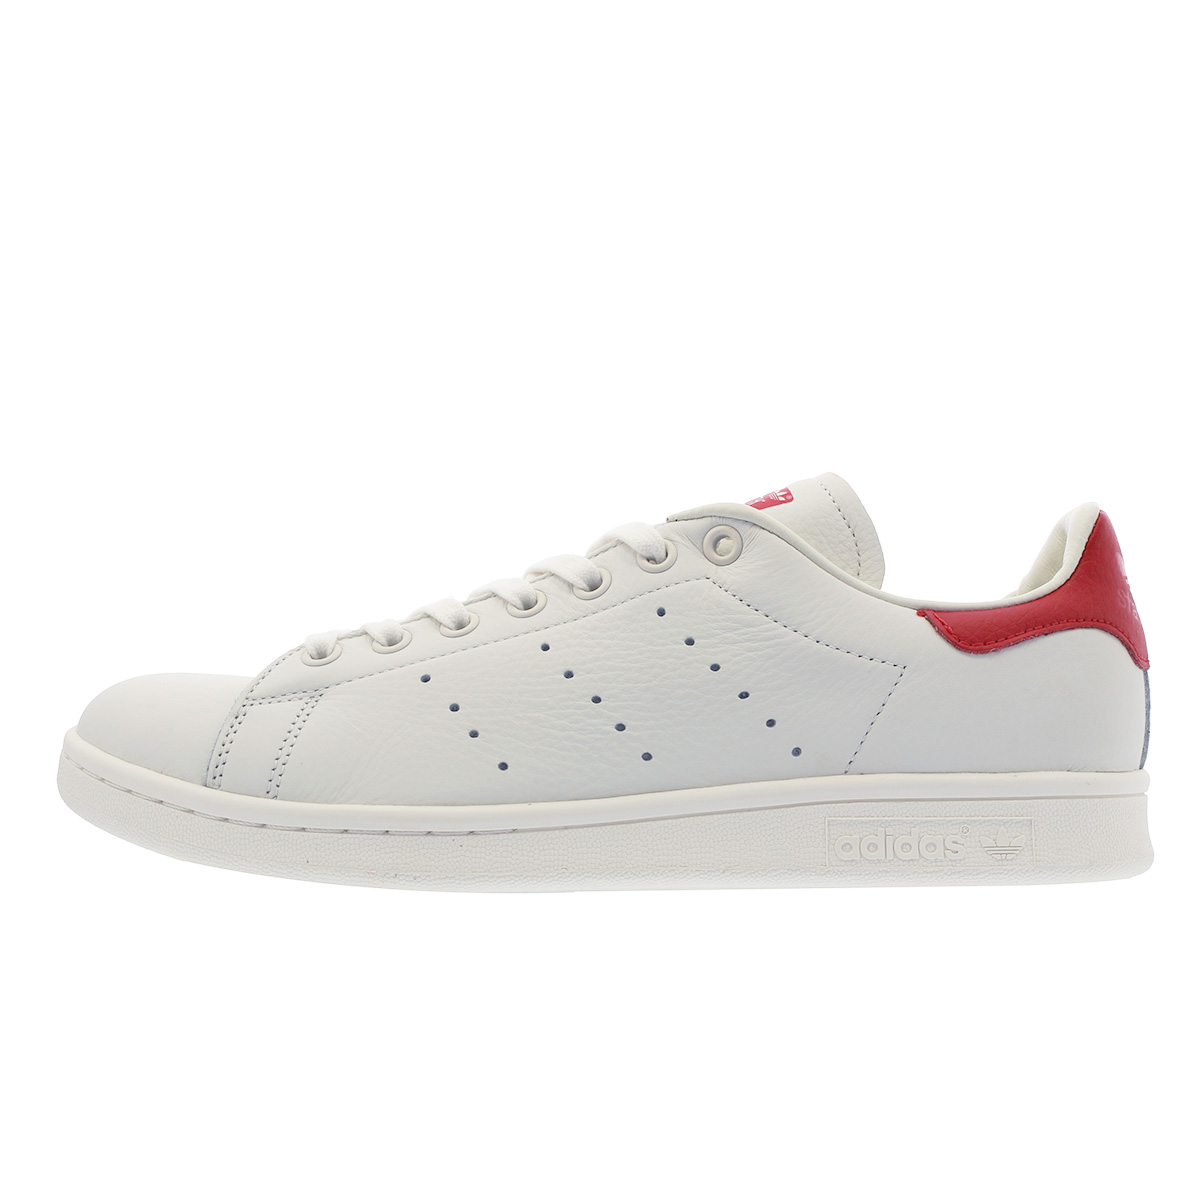 competitive price 0f061 9da17 adidas STAN SMITH Adidas Stan Smith CHALK WHITE SCARLET b37898